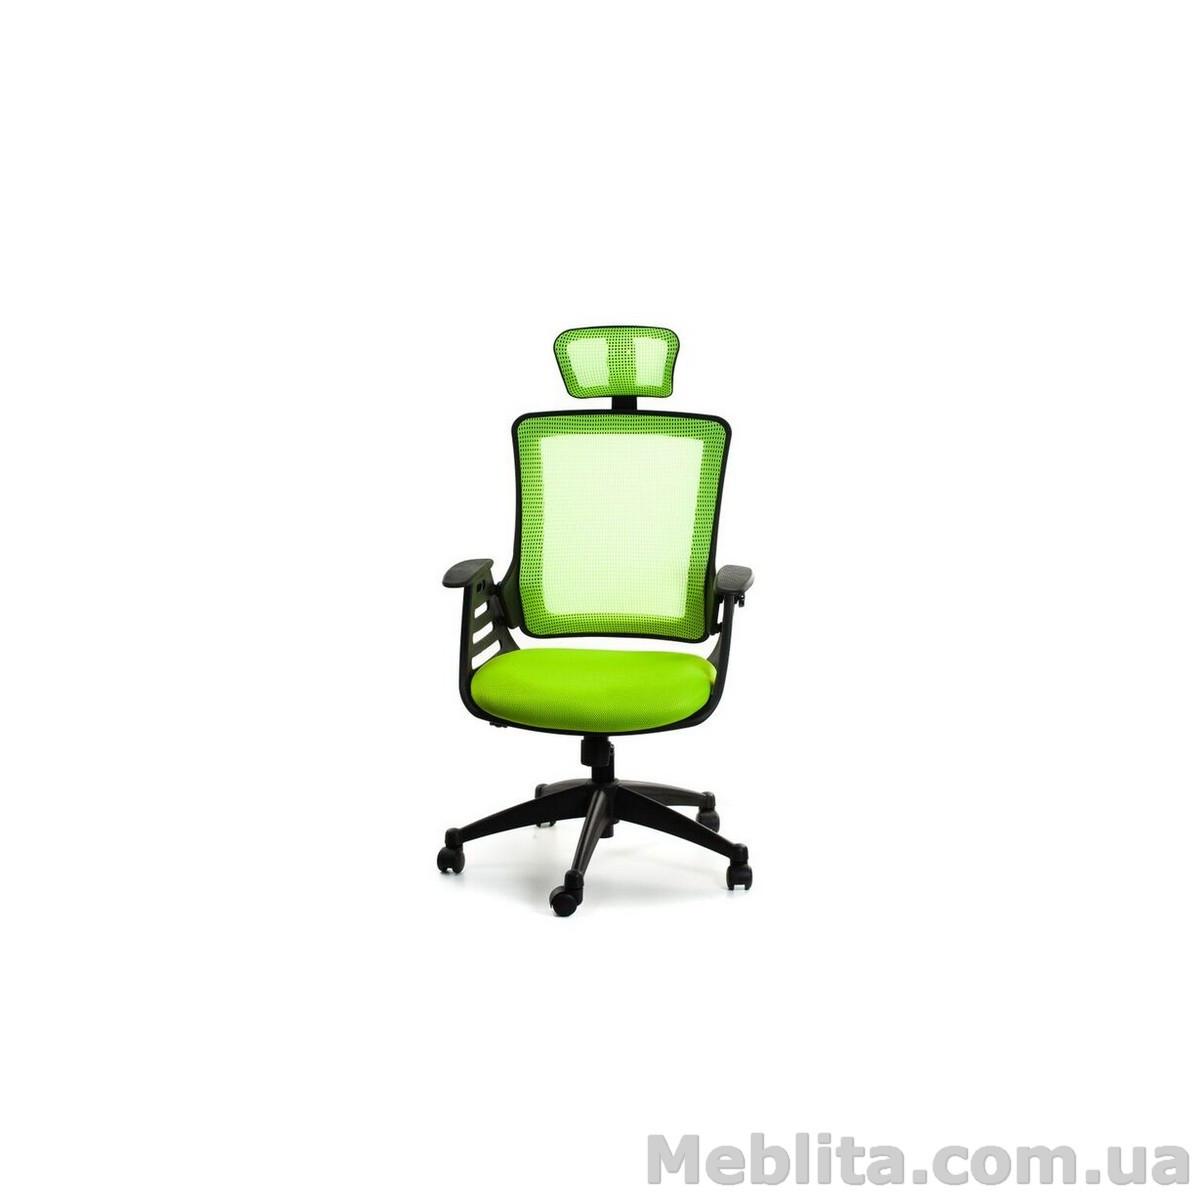 Кресло офисное MERANO headrest, Green Office4You